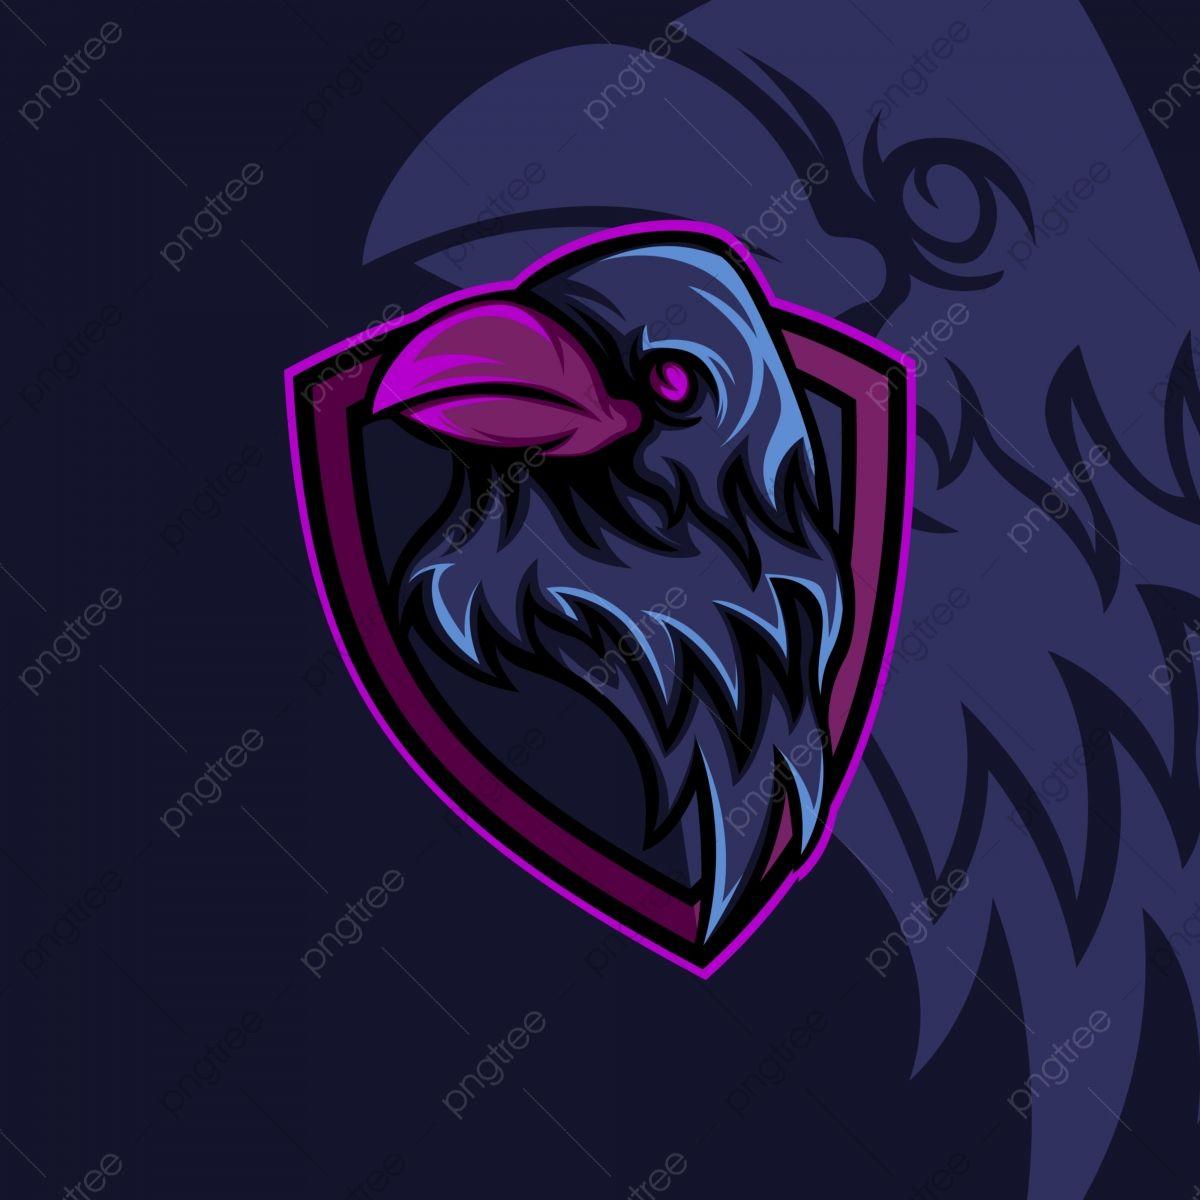 Crow Bird Esport Gaming Mascot, Brand Mark, Branding, Design PNG ...